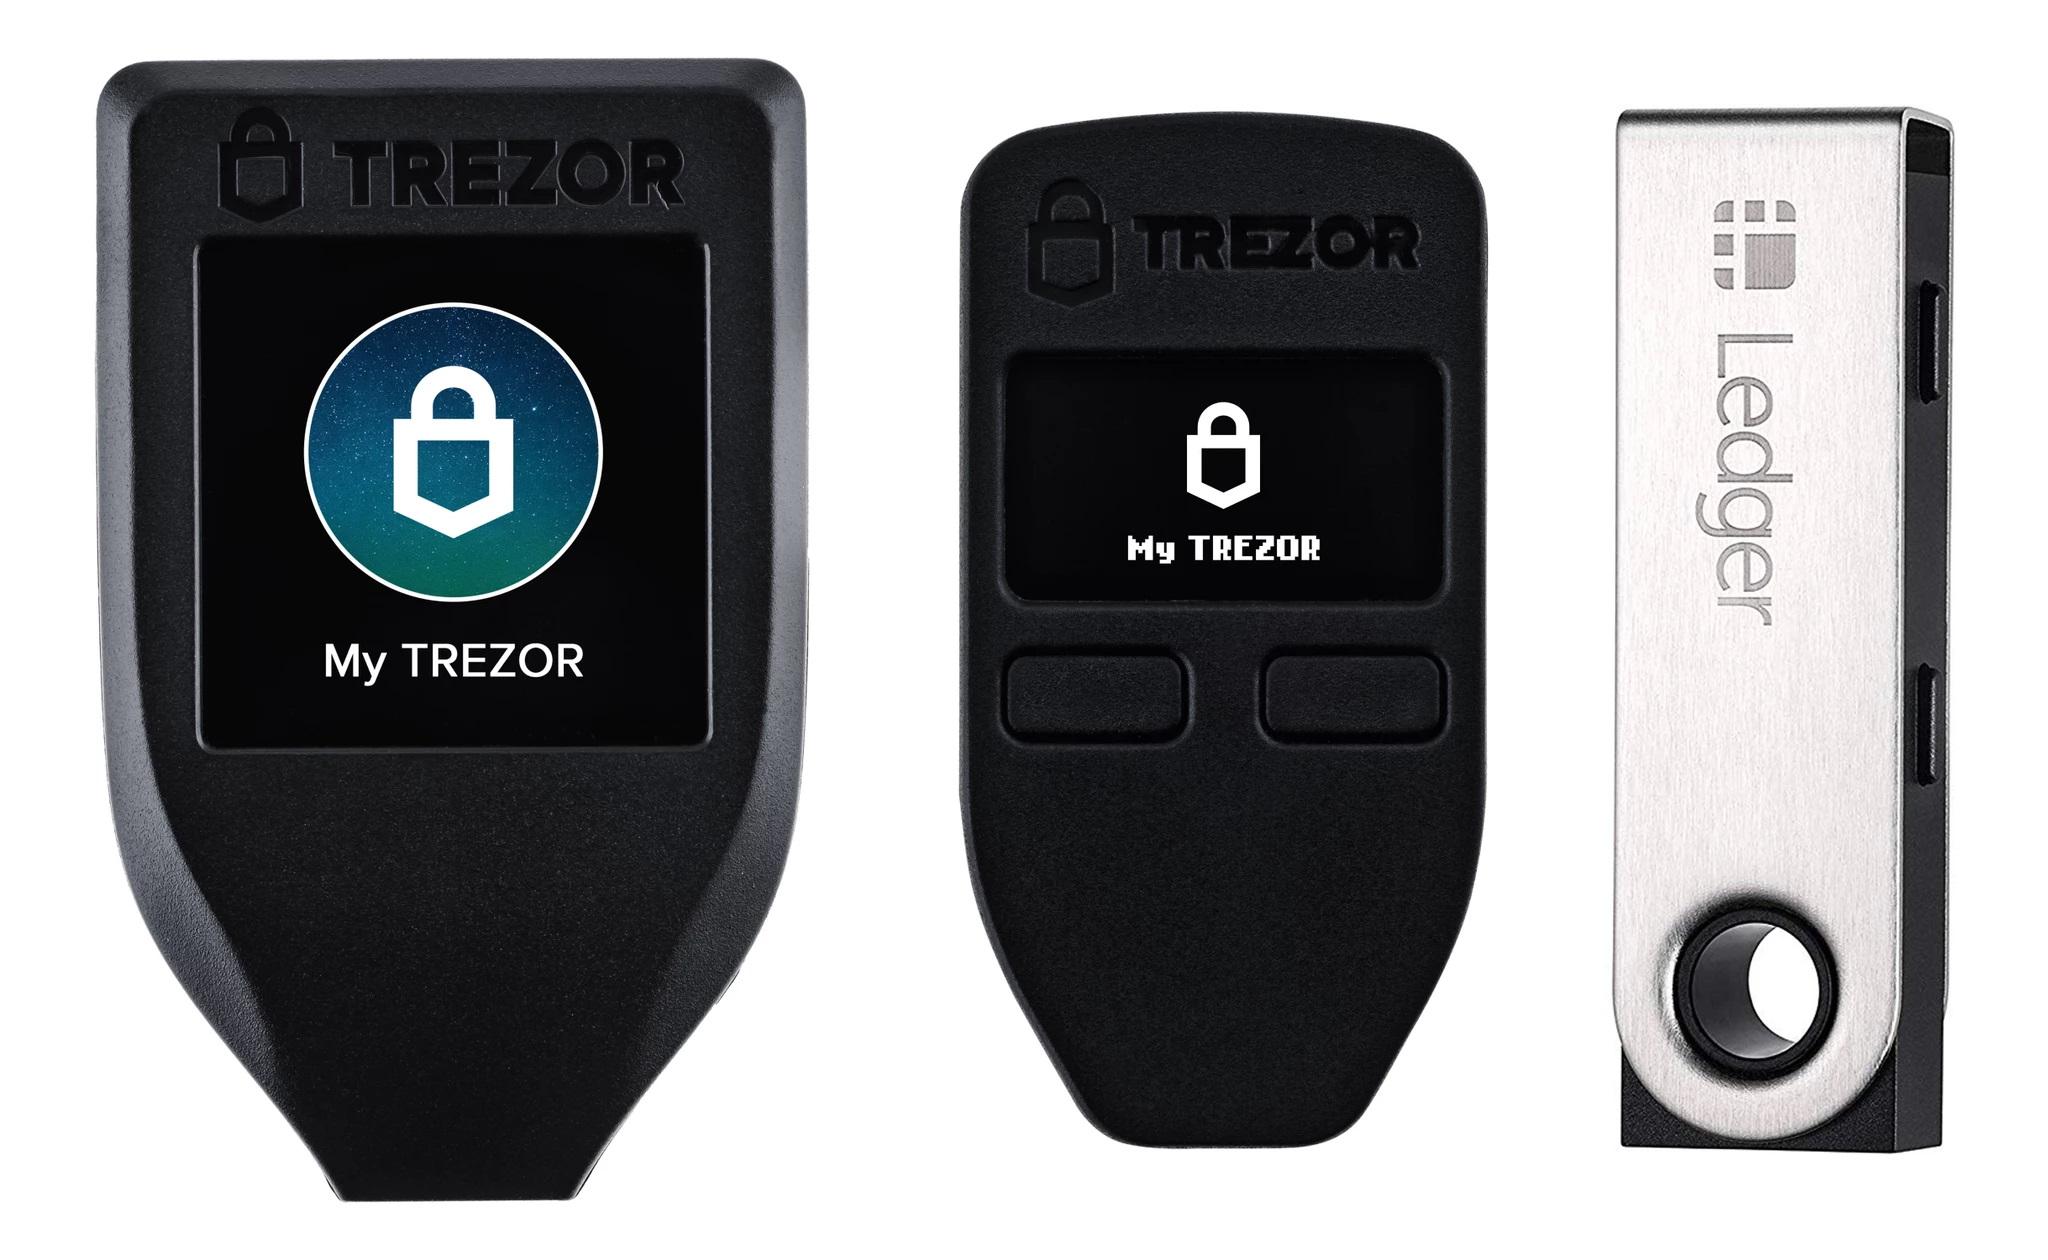 Trezor's European